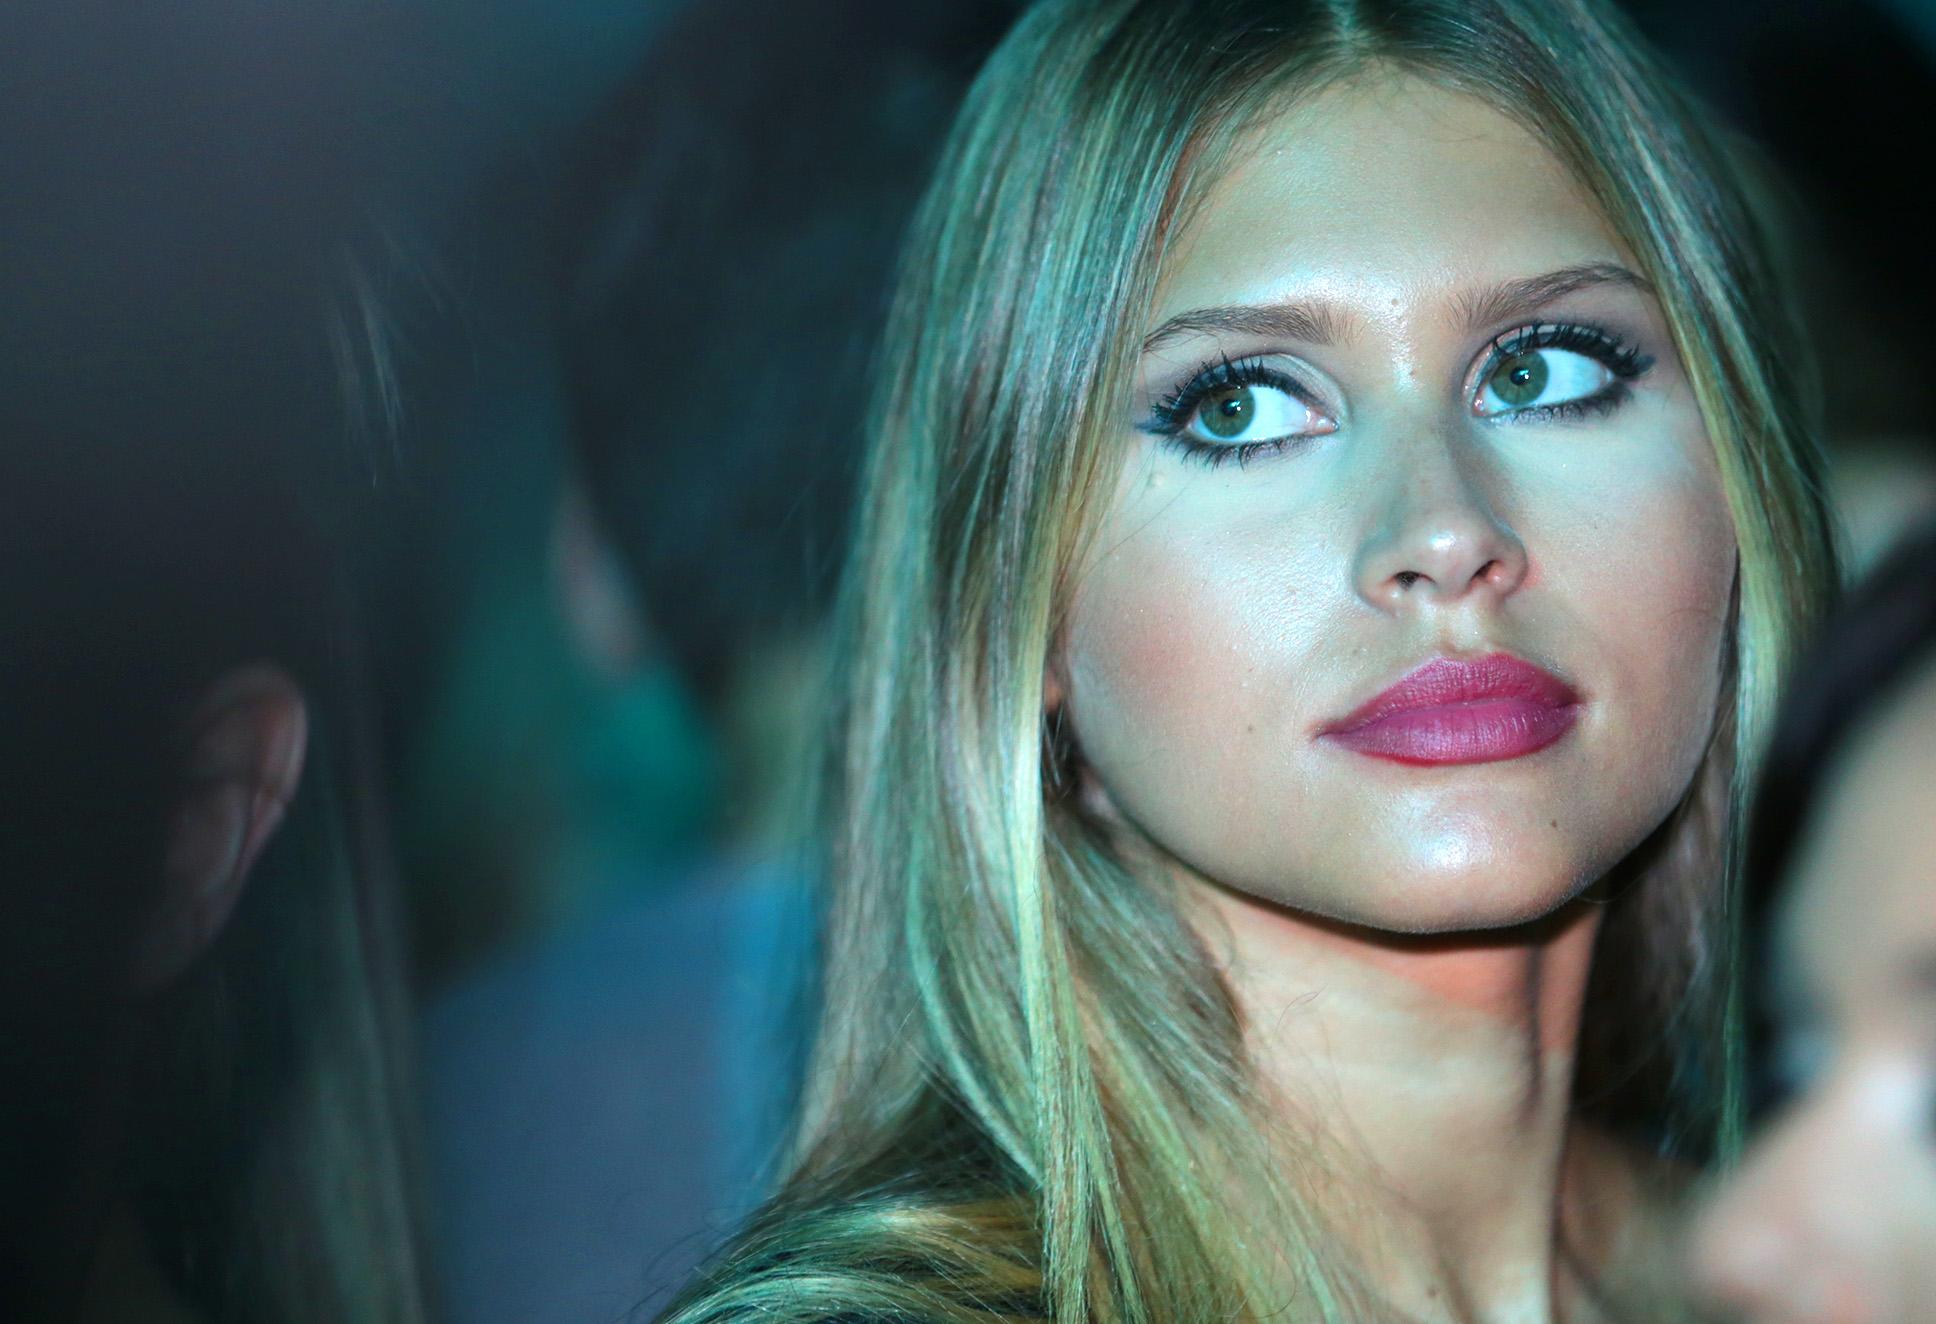 gabriele marinho, miss teen world 2012/top 5 de miss brasil mundo 2013/top 5 de miss brasil universo 2016. - Página 2 5szvrgnp